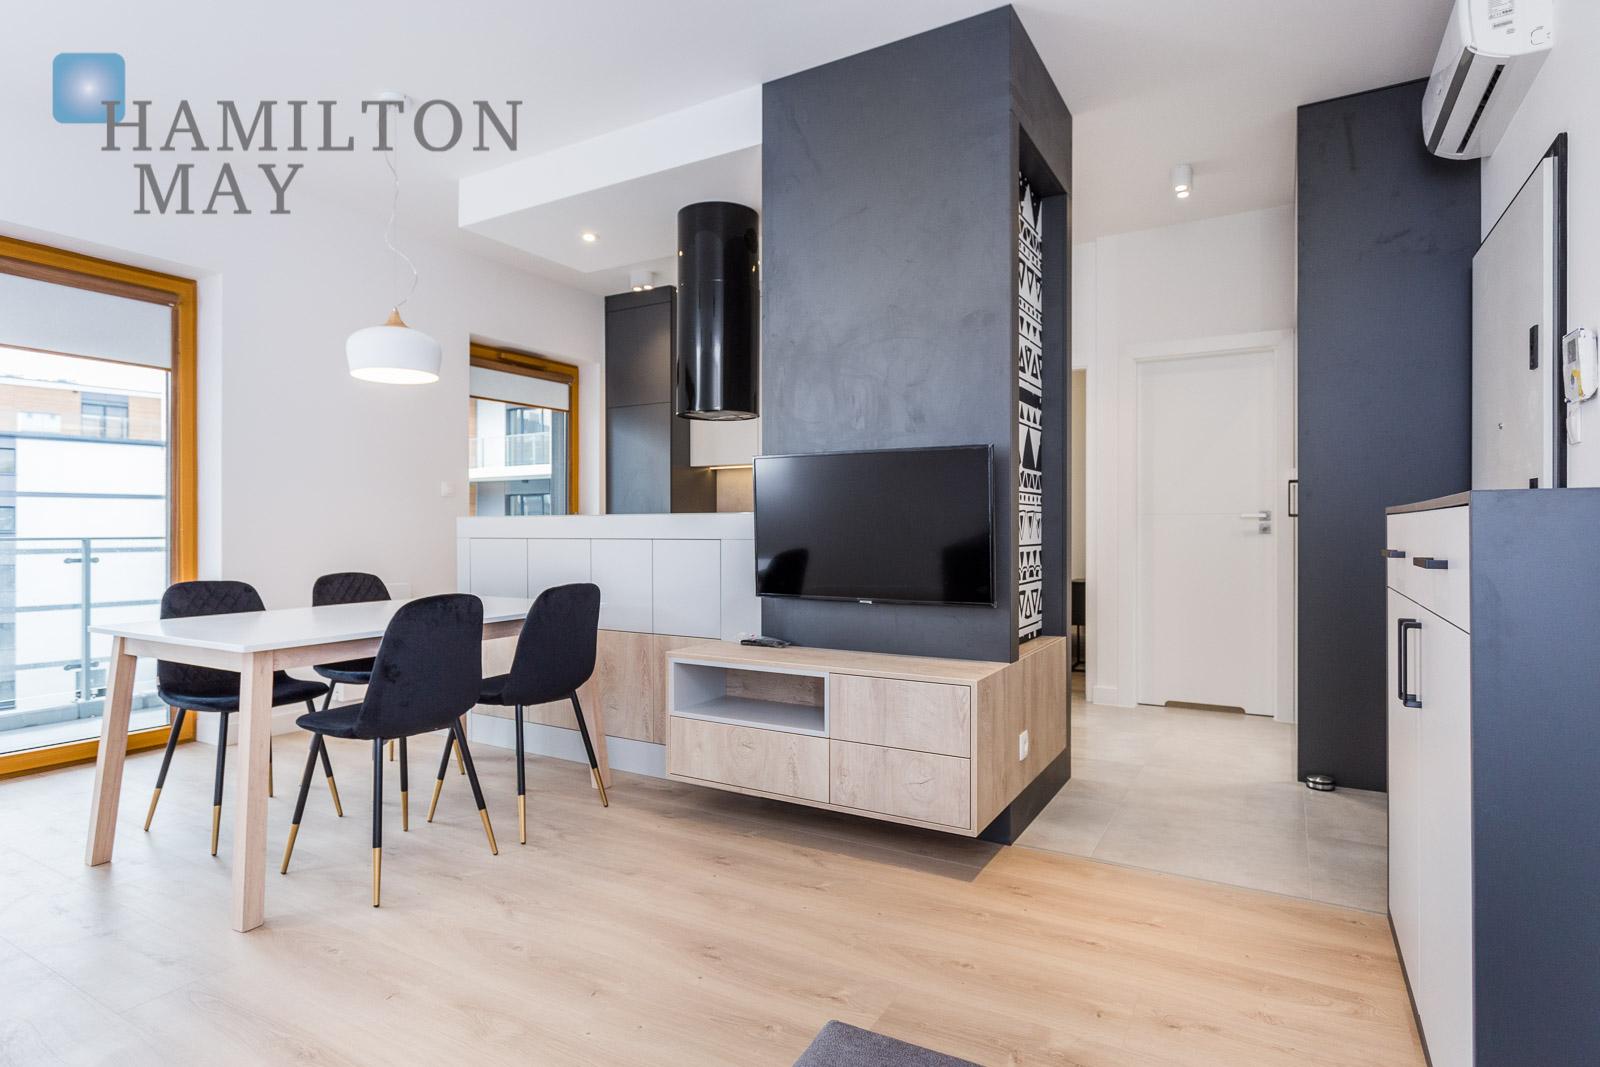 A Beautiful And Contemporary One Bedroom Apartment With Balcony In The Prestigious Novum Development Rakowicka Krakow For Rental Ref 14217 Hamilton May